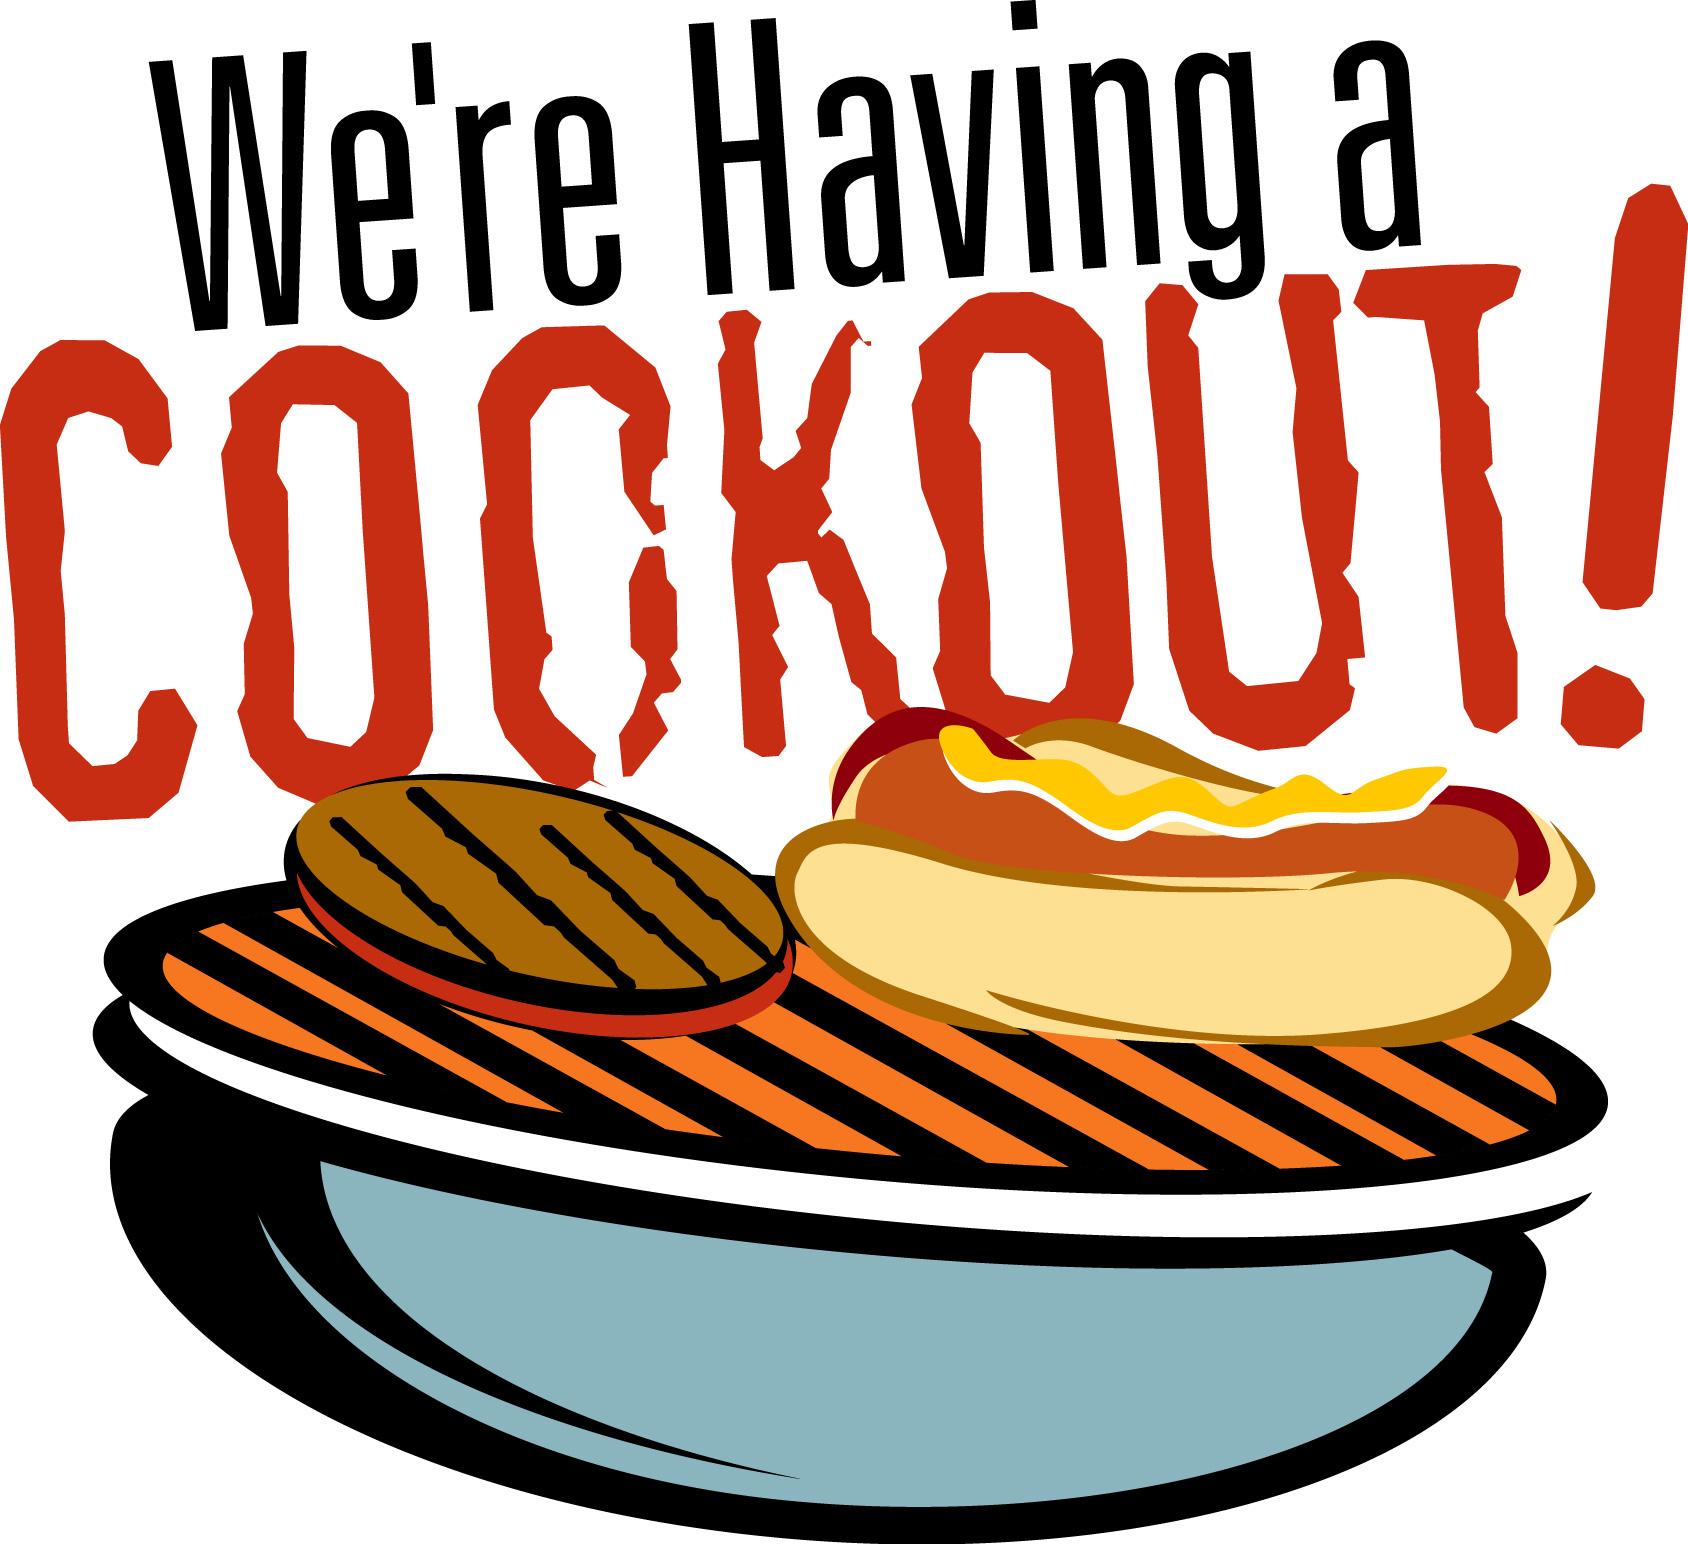 Cookout clipart. Free pictures clipartix